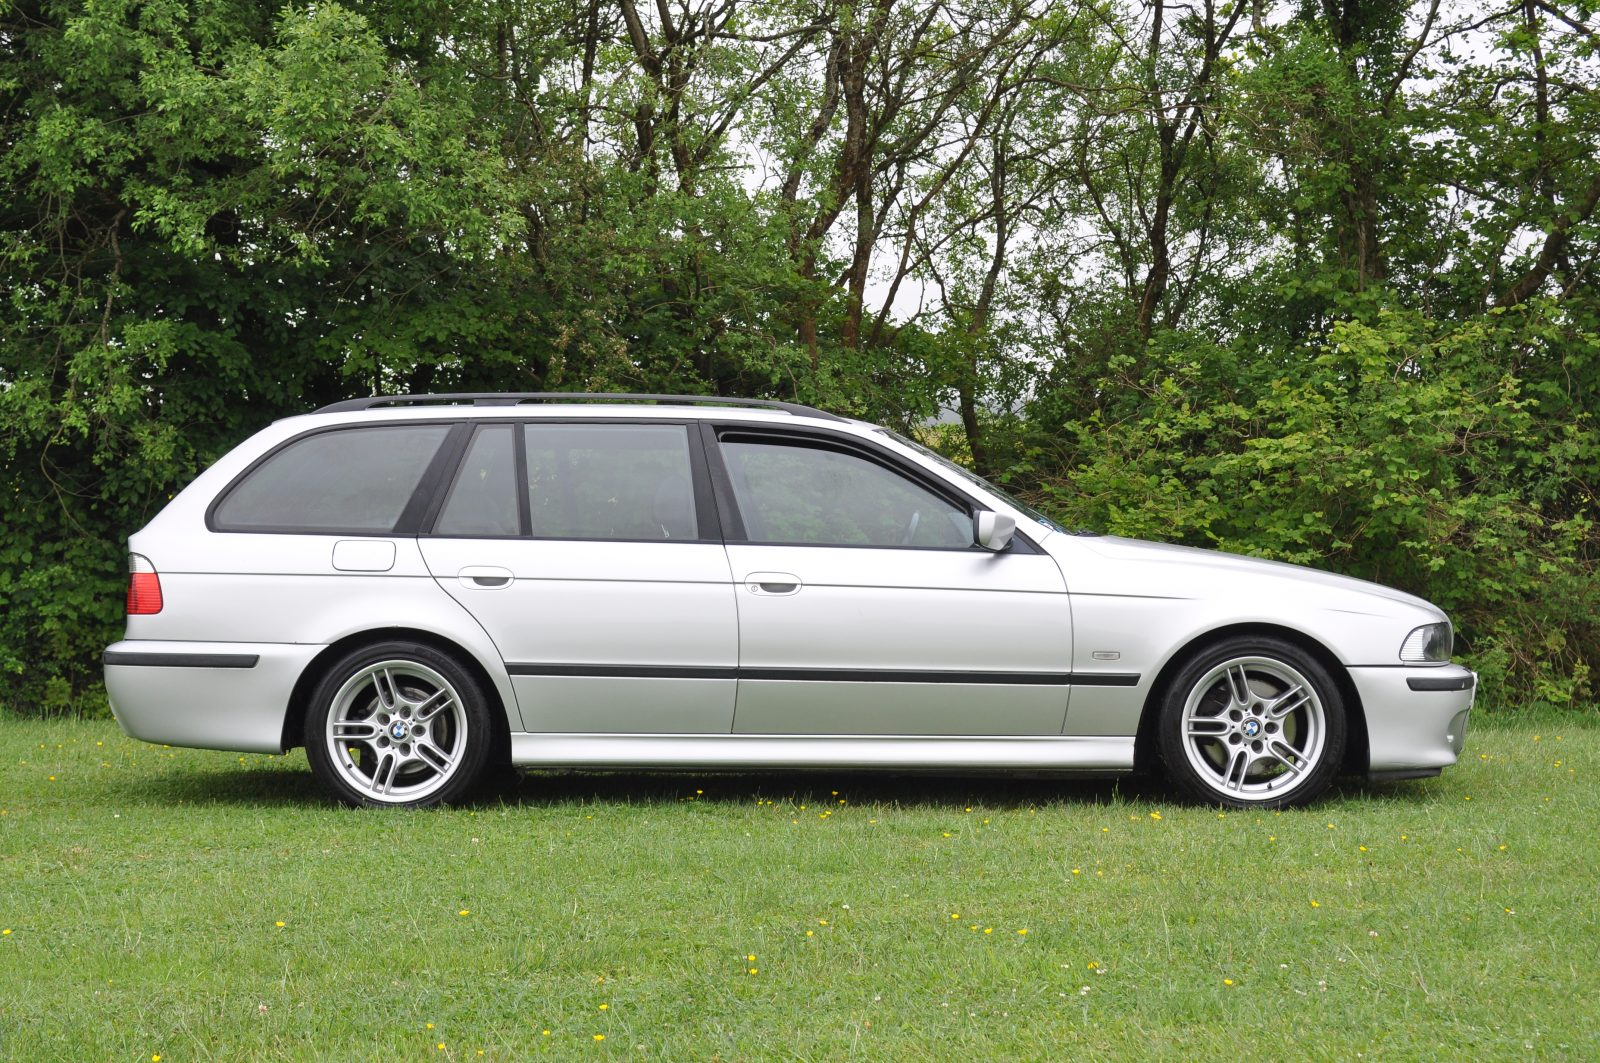 2002 bmw 530d touring m sport auto jap imports uk. Black Bedroom Furniture Sets. Home Design Ideas